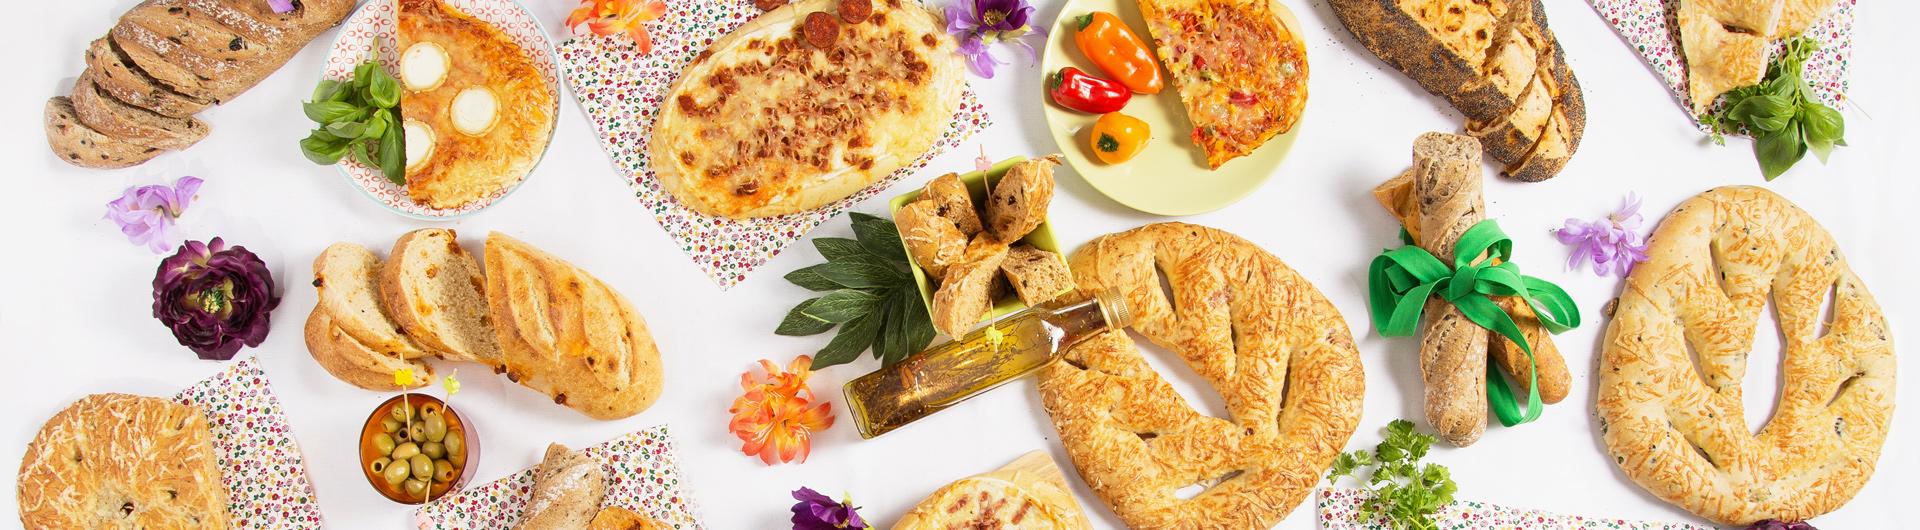 Pains-gourmands-Ambiance-printemps-article-briogel